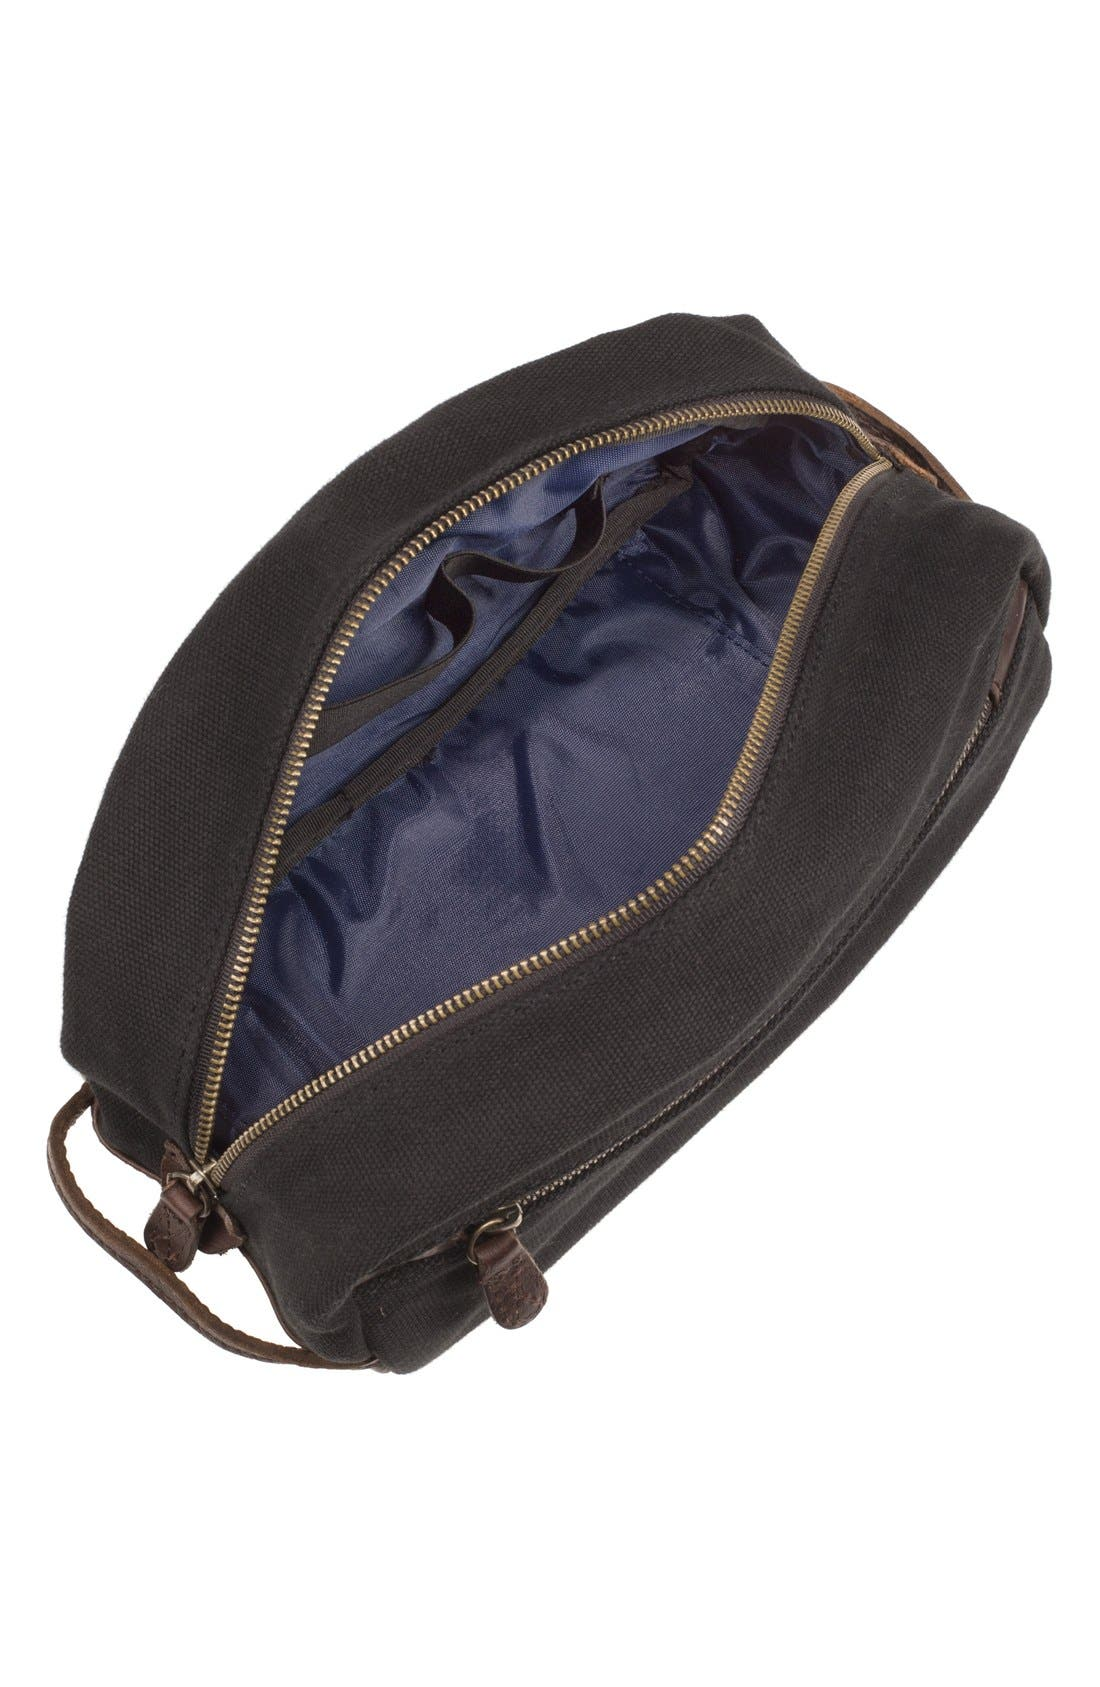 Alternate Image 2  - Will Leather Goods 'Grady' Travel Kit